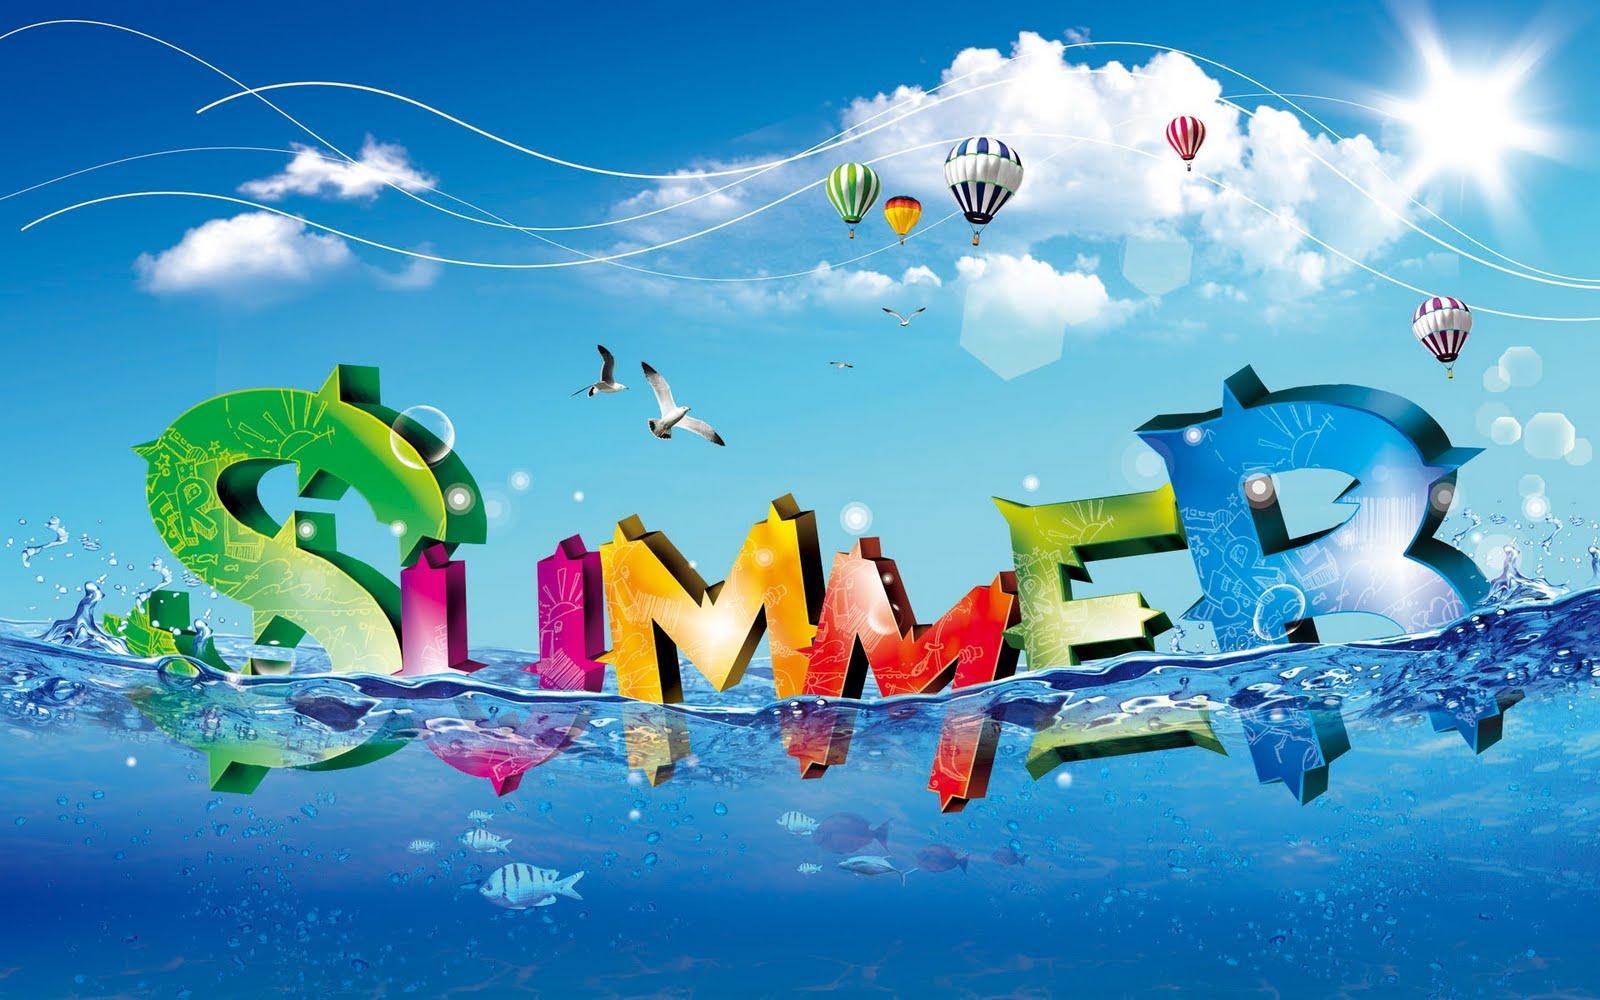 Mooie-zomer-achtergronden-hd-wallpaper-zomer-wallpapers-5.jpg